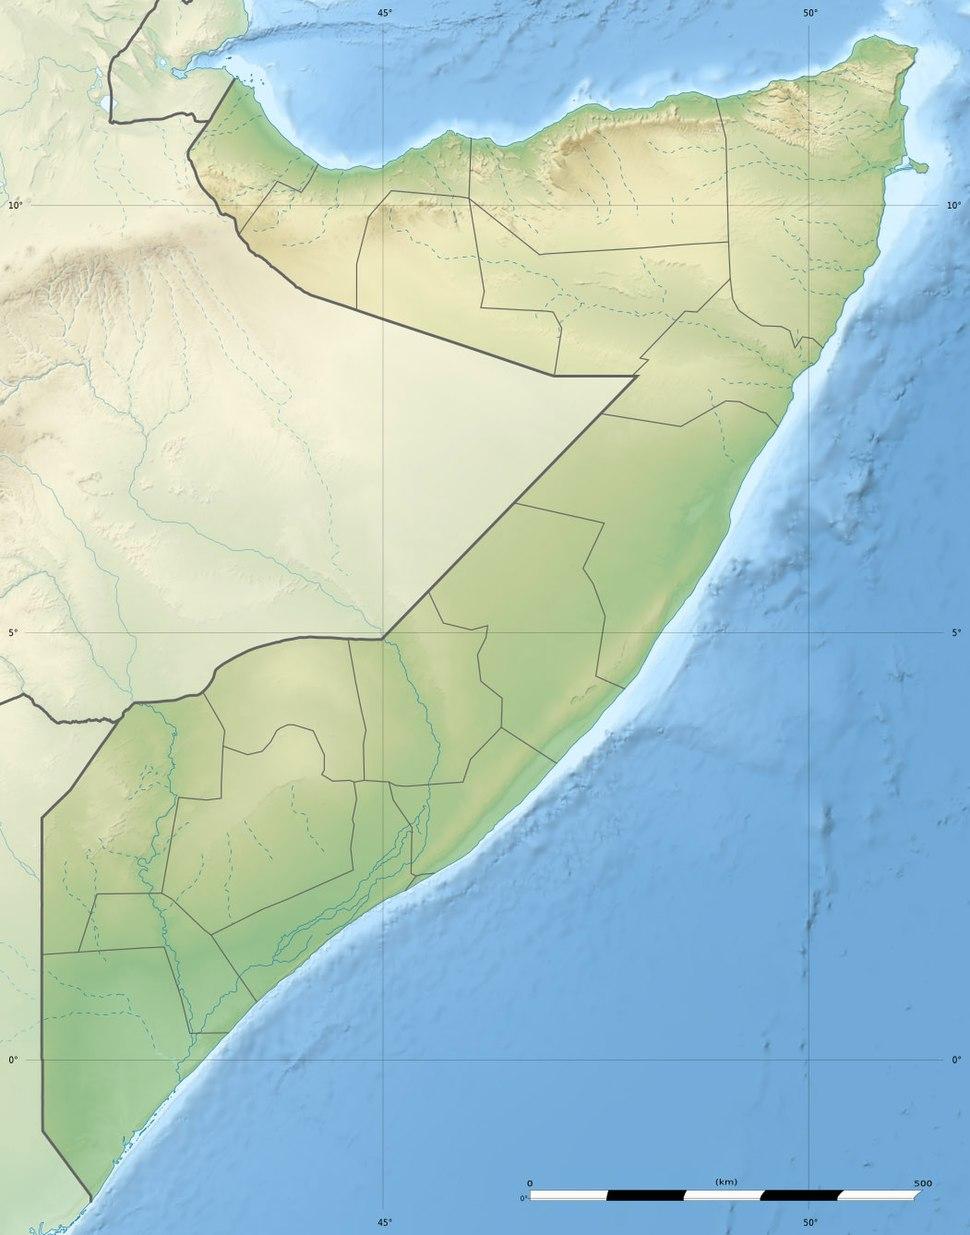 Mogadishu is located in Somalia